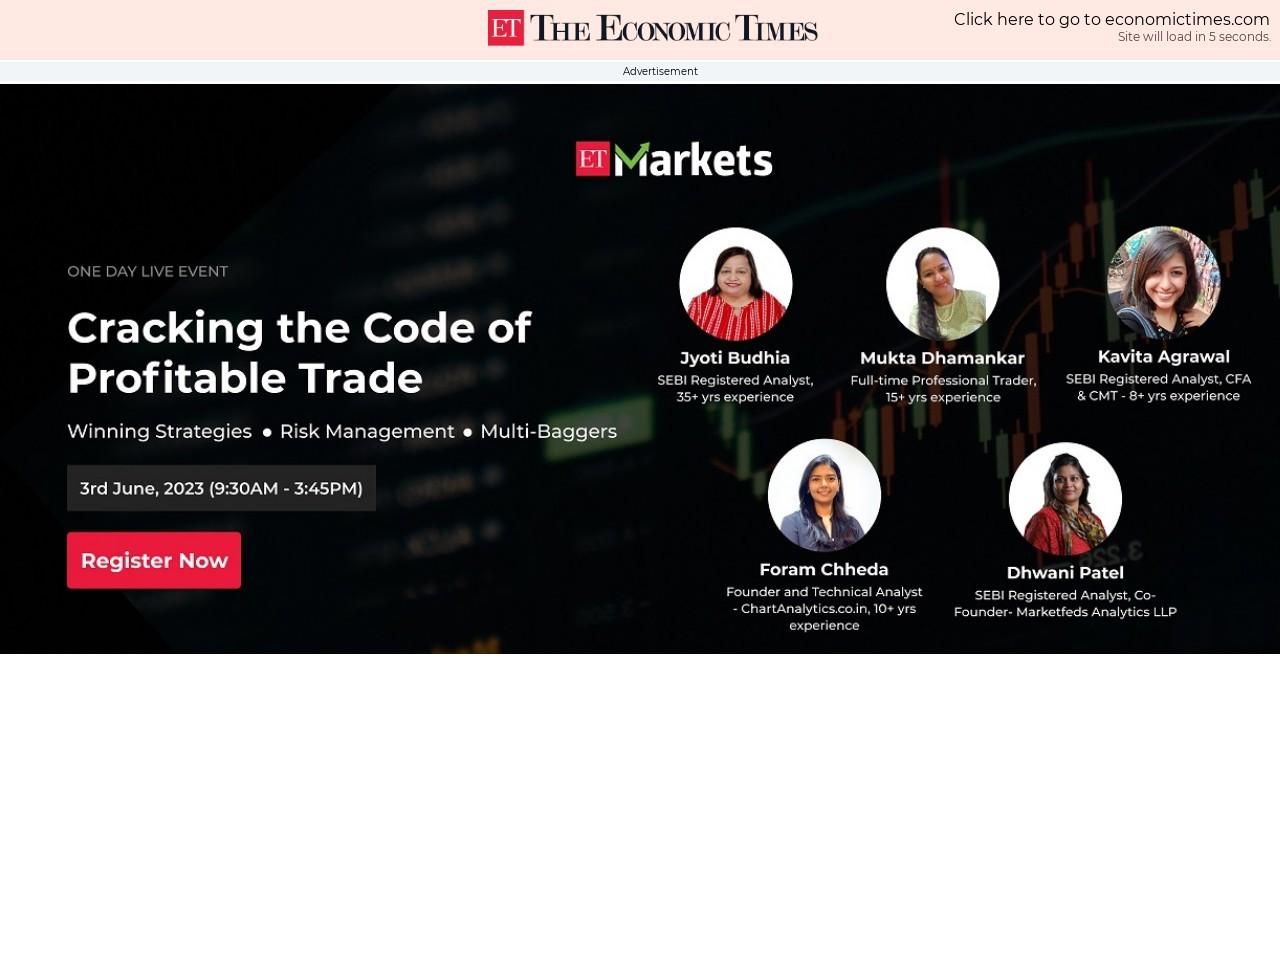 Top crypto prices today: Polkadot, Binance Coin rally up to 15%; Solana tanks – Economic Times